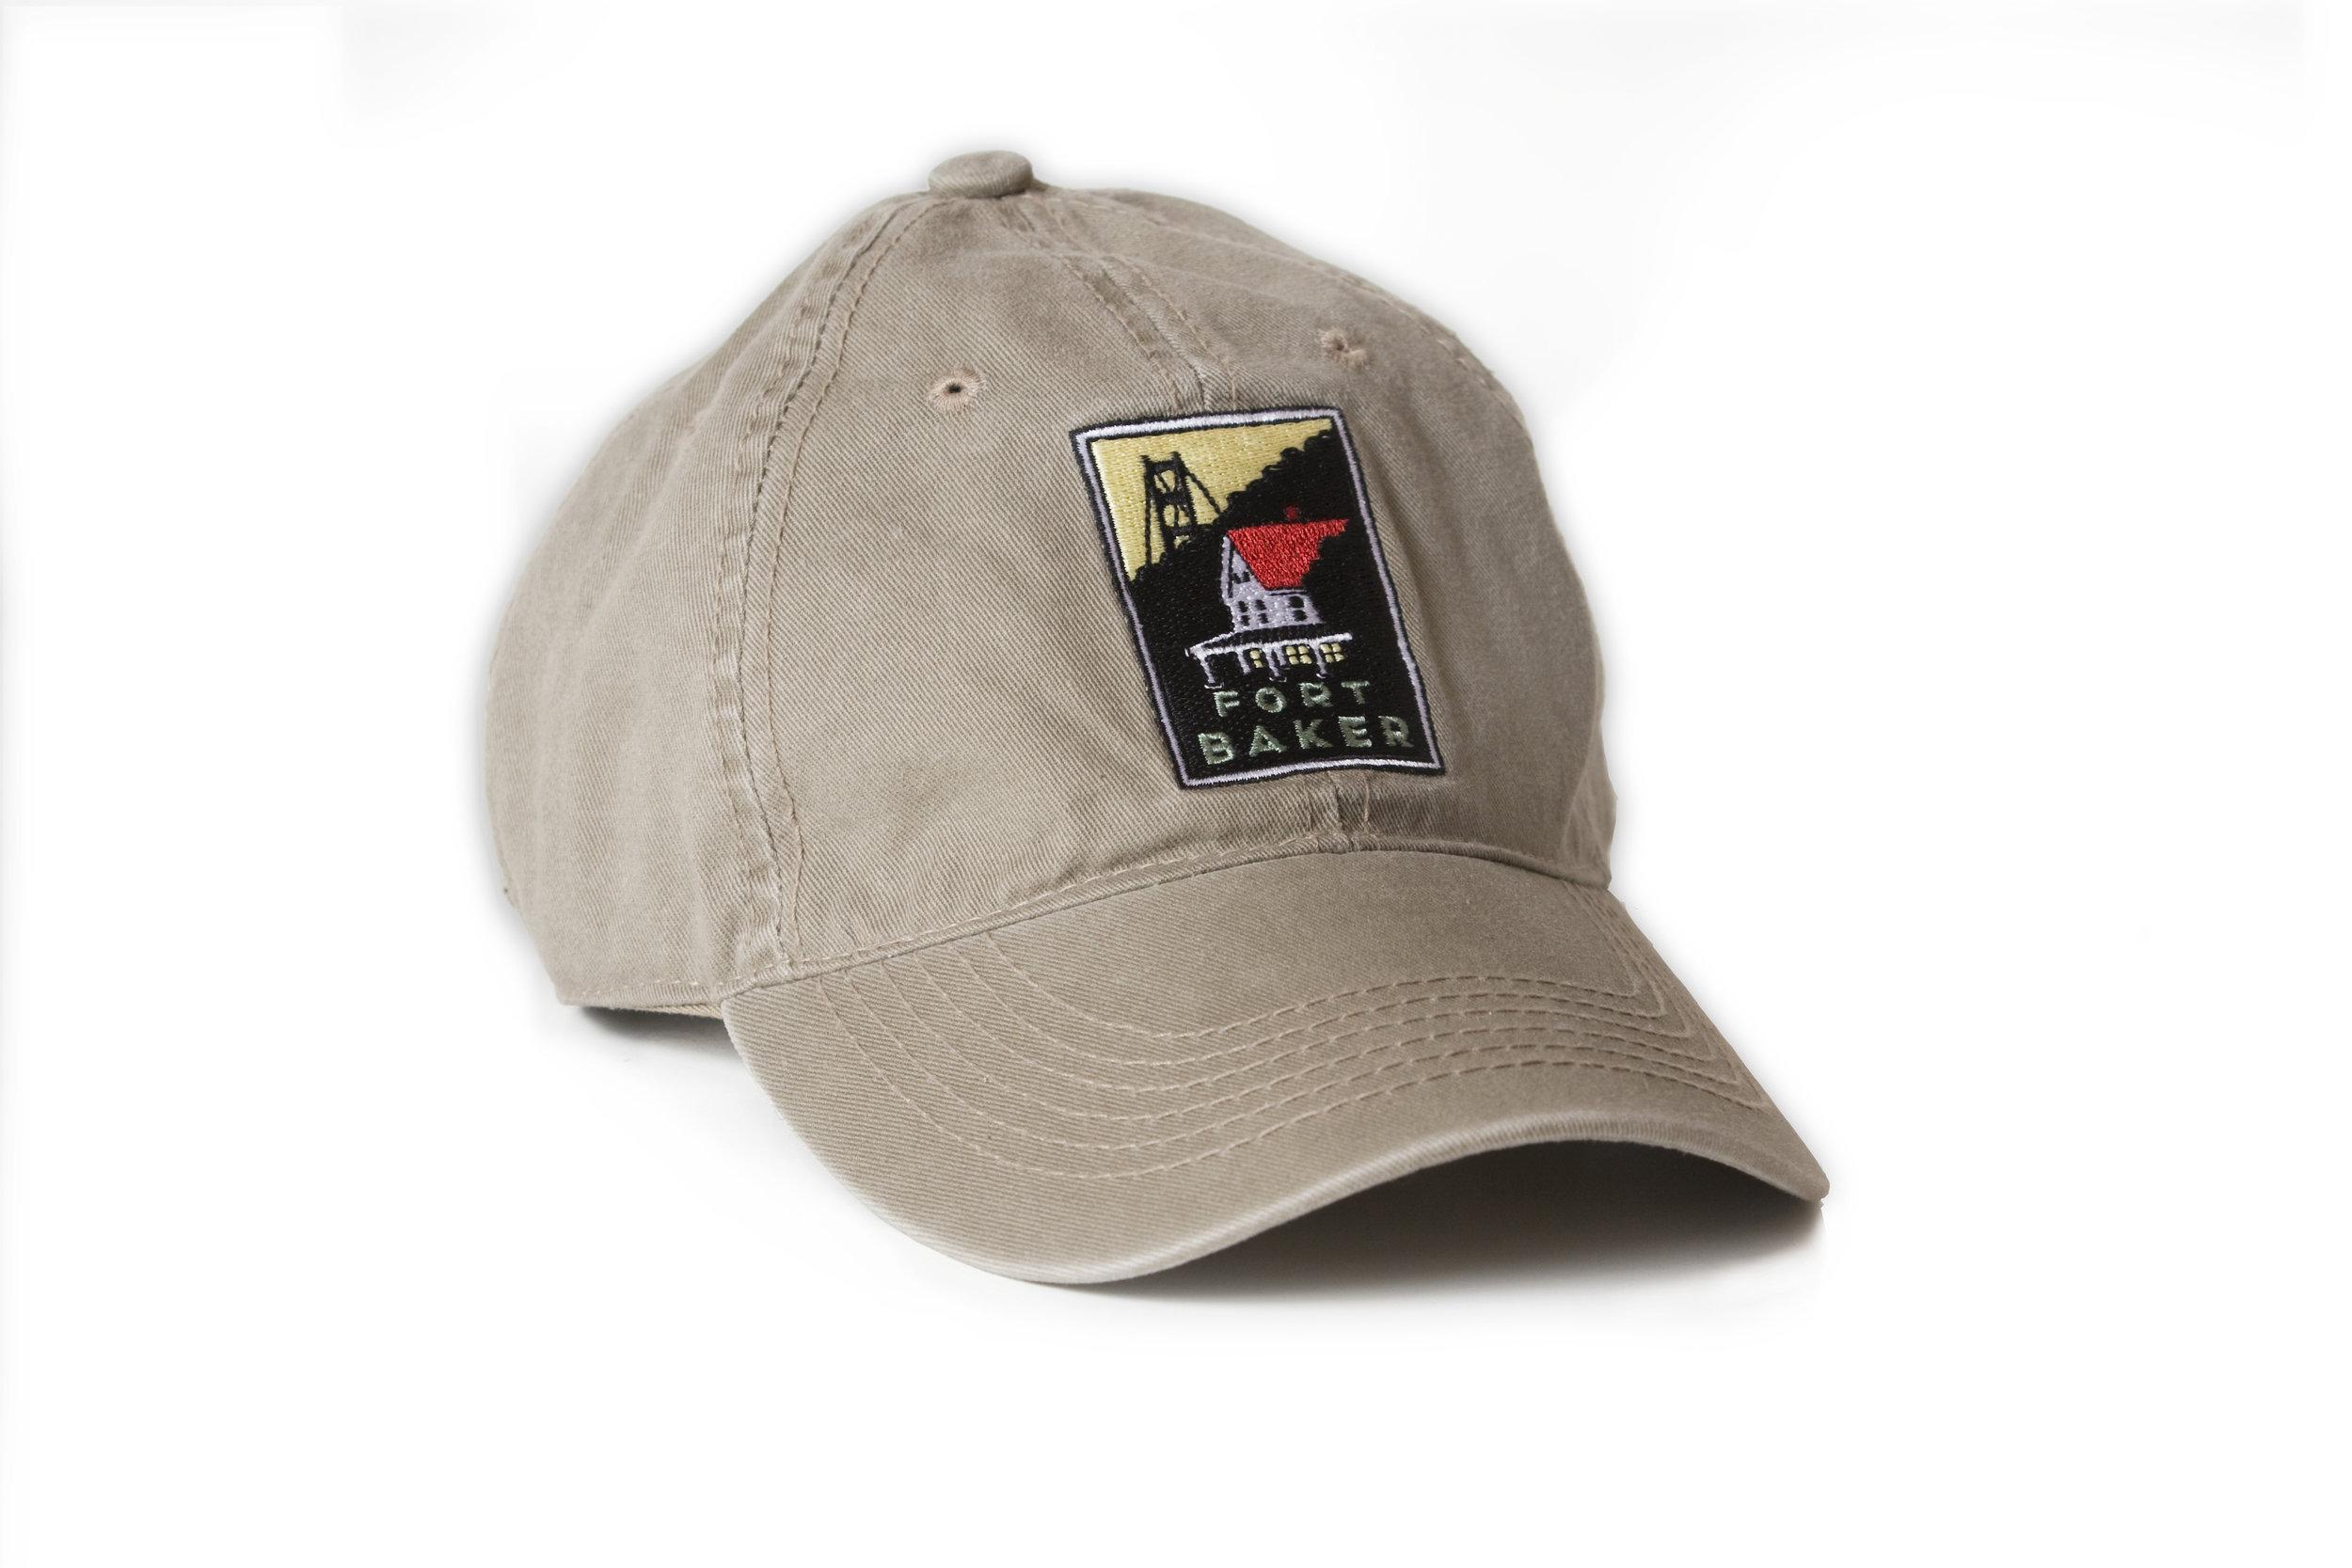 You may also like: - Fort Baker Baseball Cap